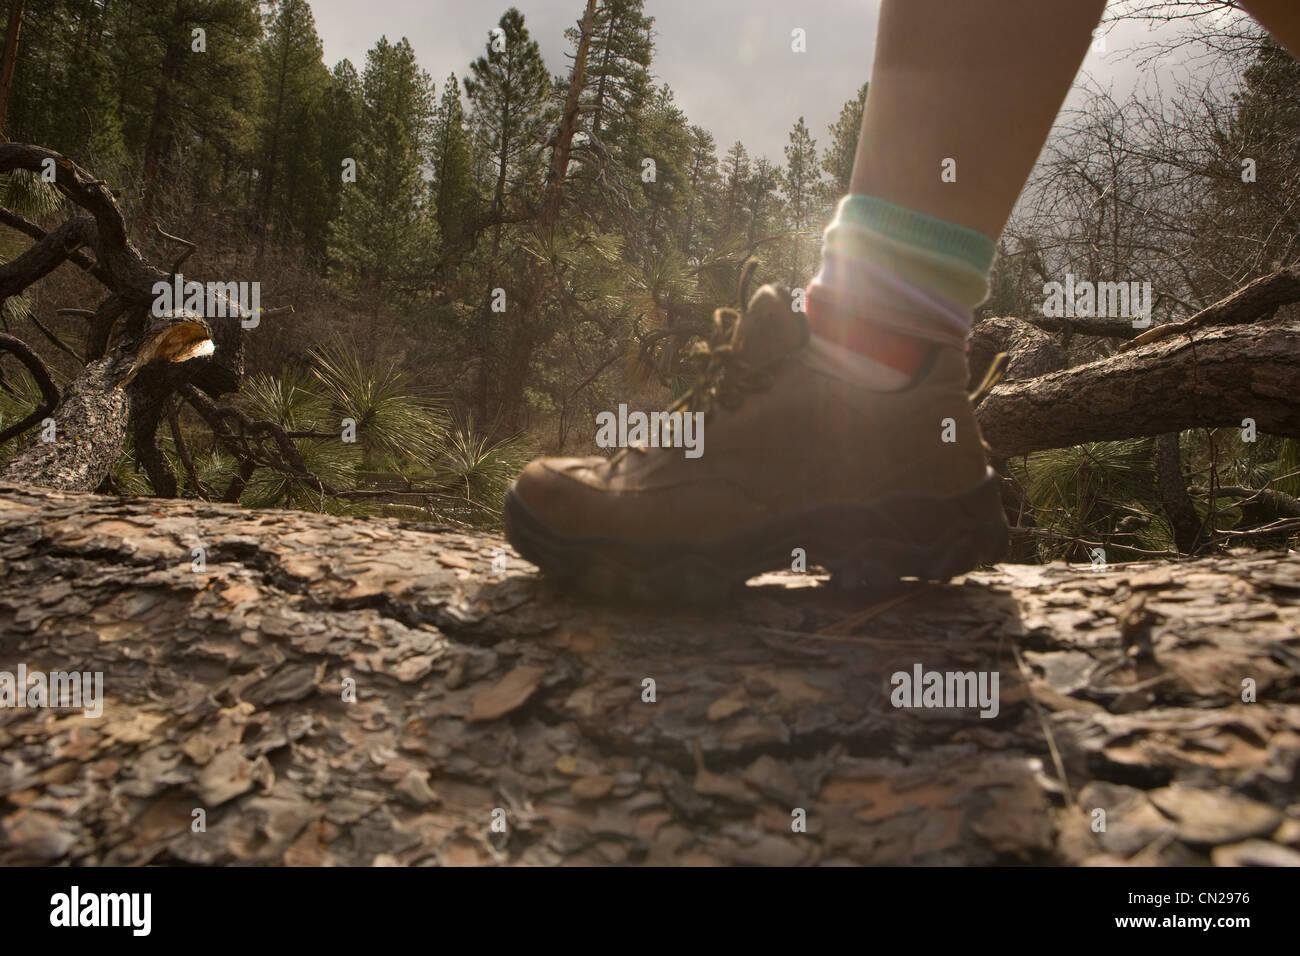 Woman hiking along tree trunk - Stock Image